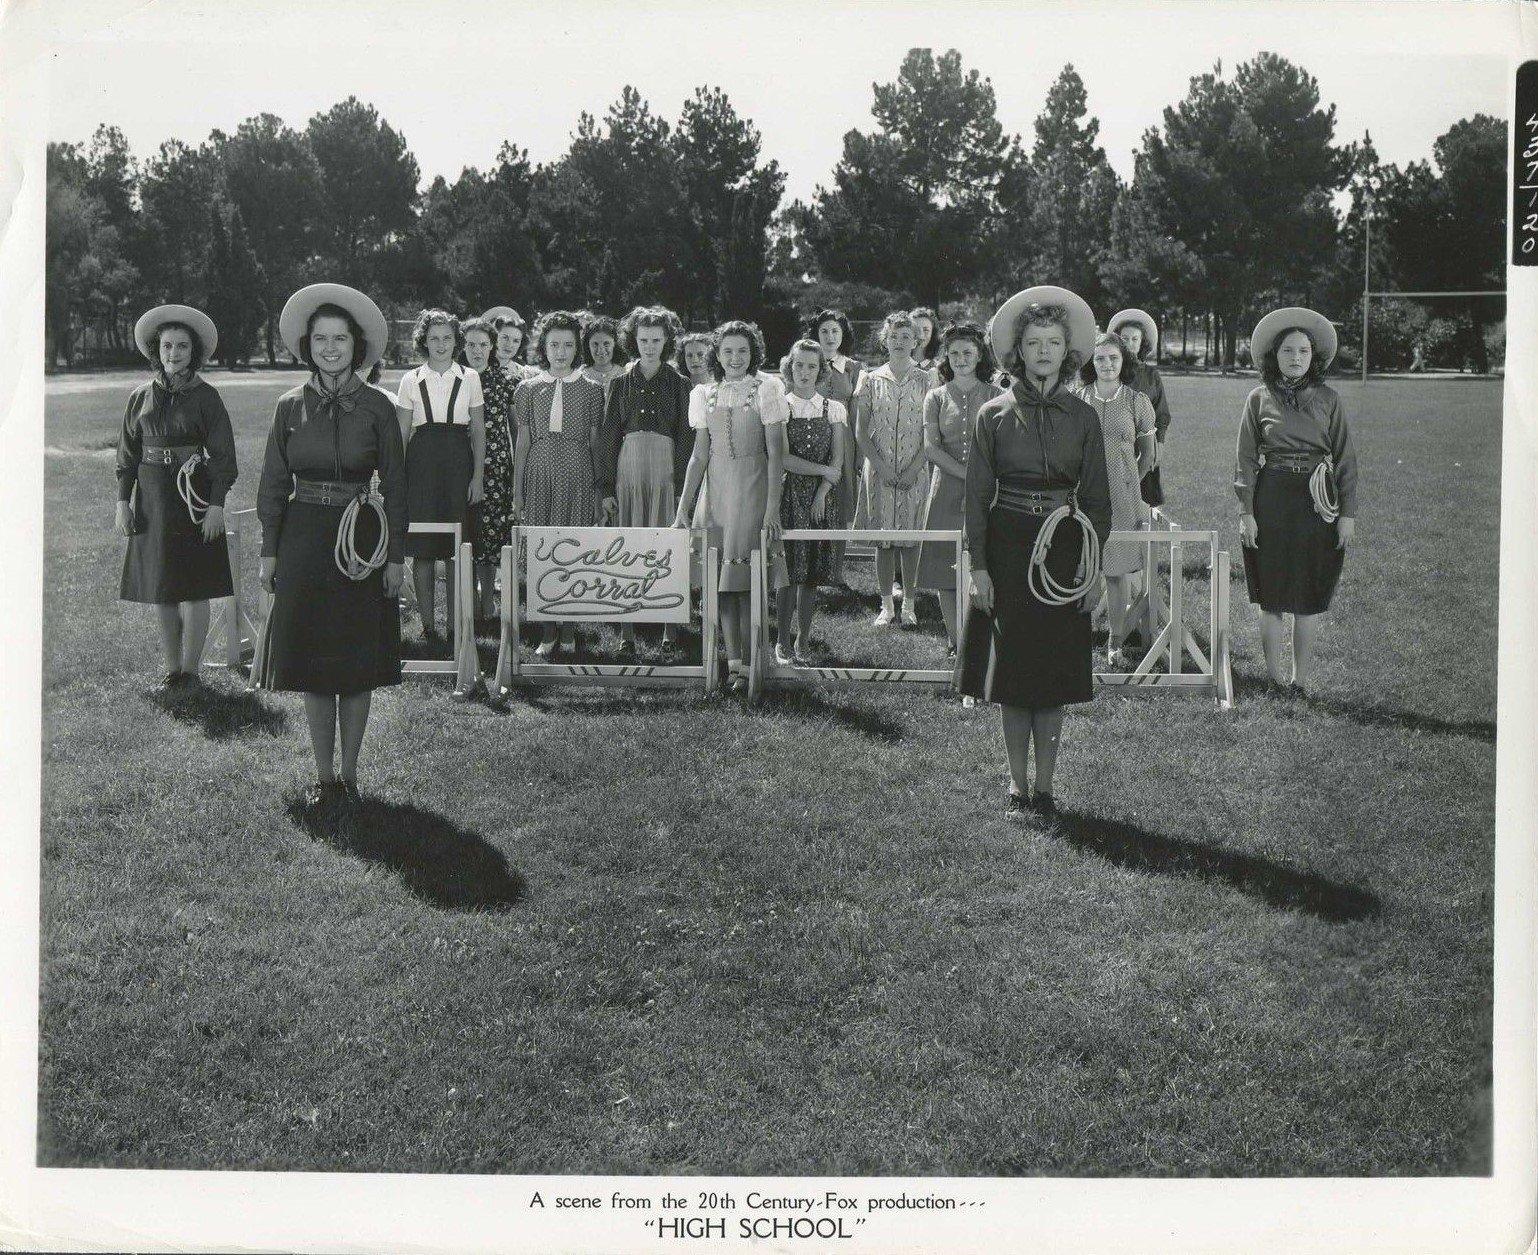 Gwen Brian, Betty Jean Hainey, Carmencita Johnson, Dorothy Moore, Lillian Porter, Jane Withers, and Doris Brian in High School (1940)